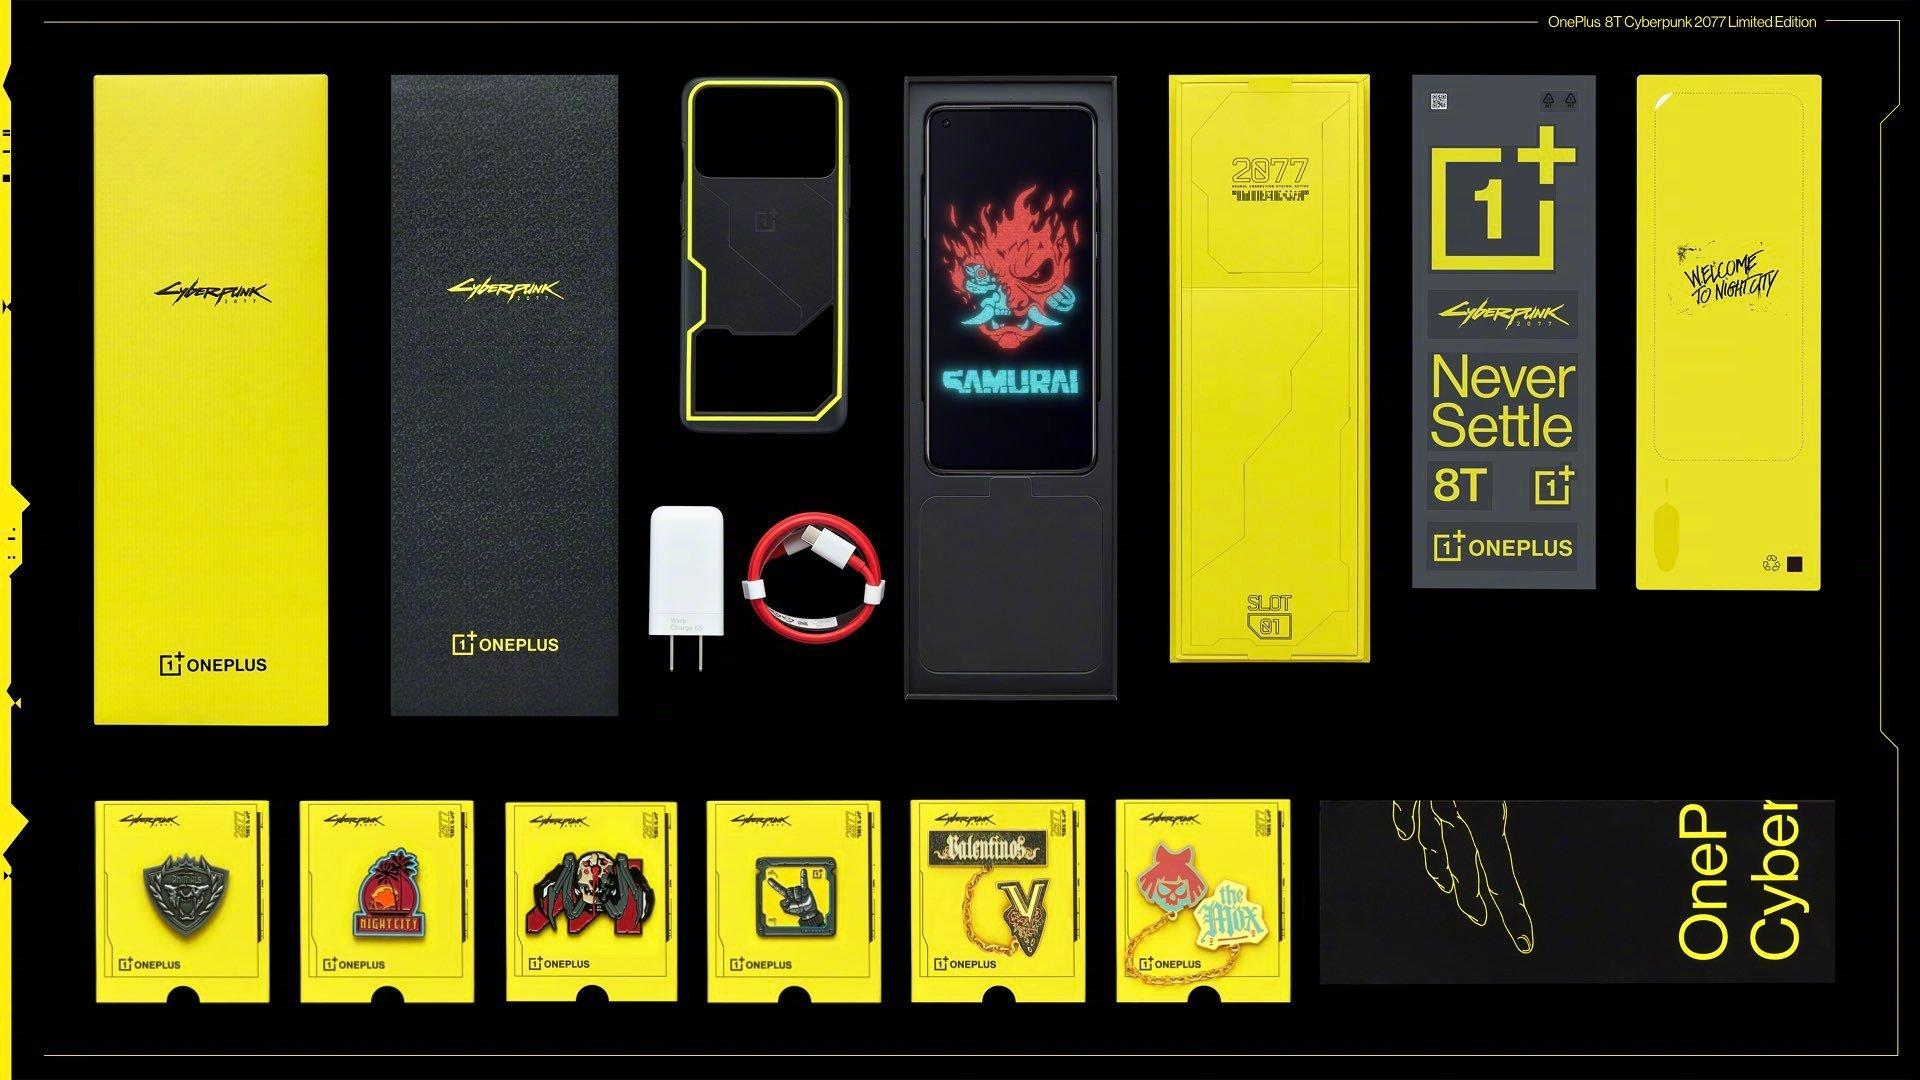 OnePlus 8T Cyberpunk 2077 Edition Box Accessories